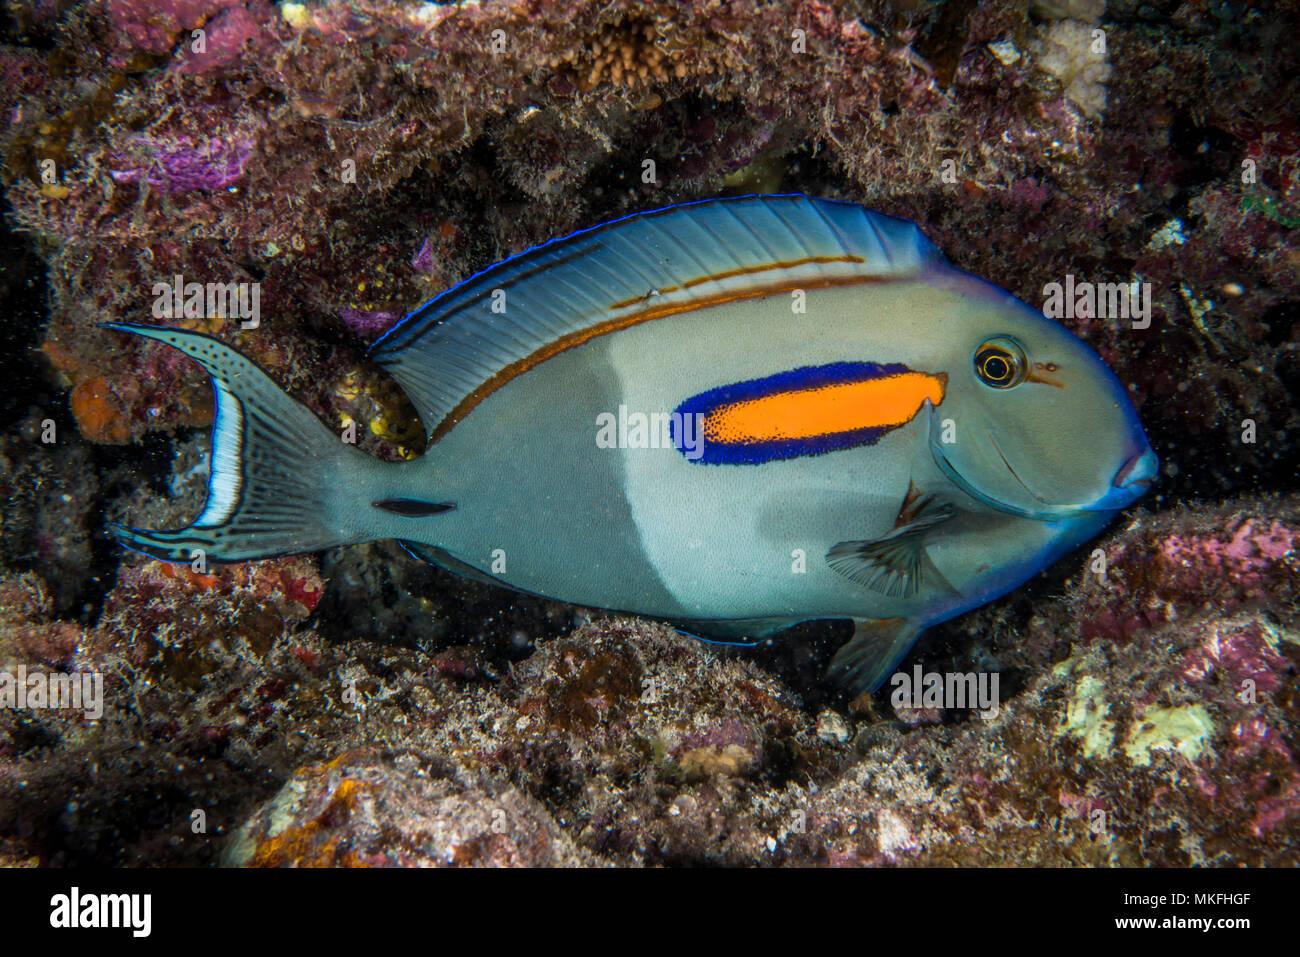 Orangespot surgeonfish (Acanthurus olivaceus) in reef, Tahiti, Polynesie Francaise - Stock Image